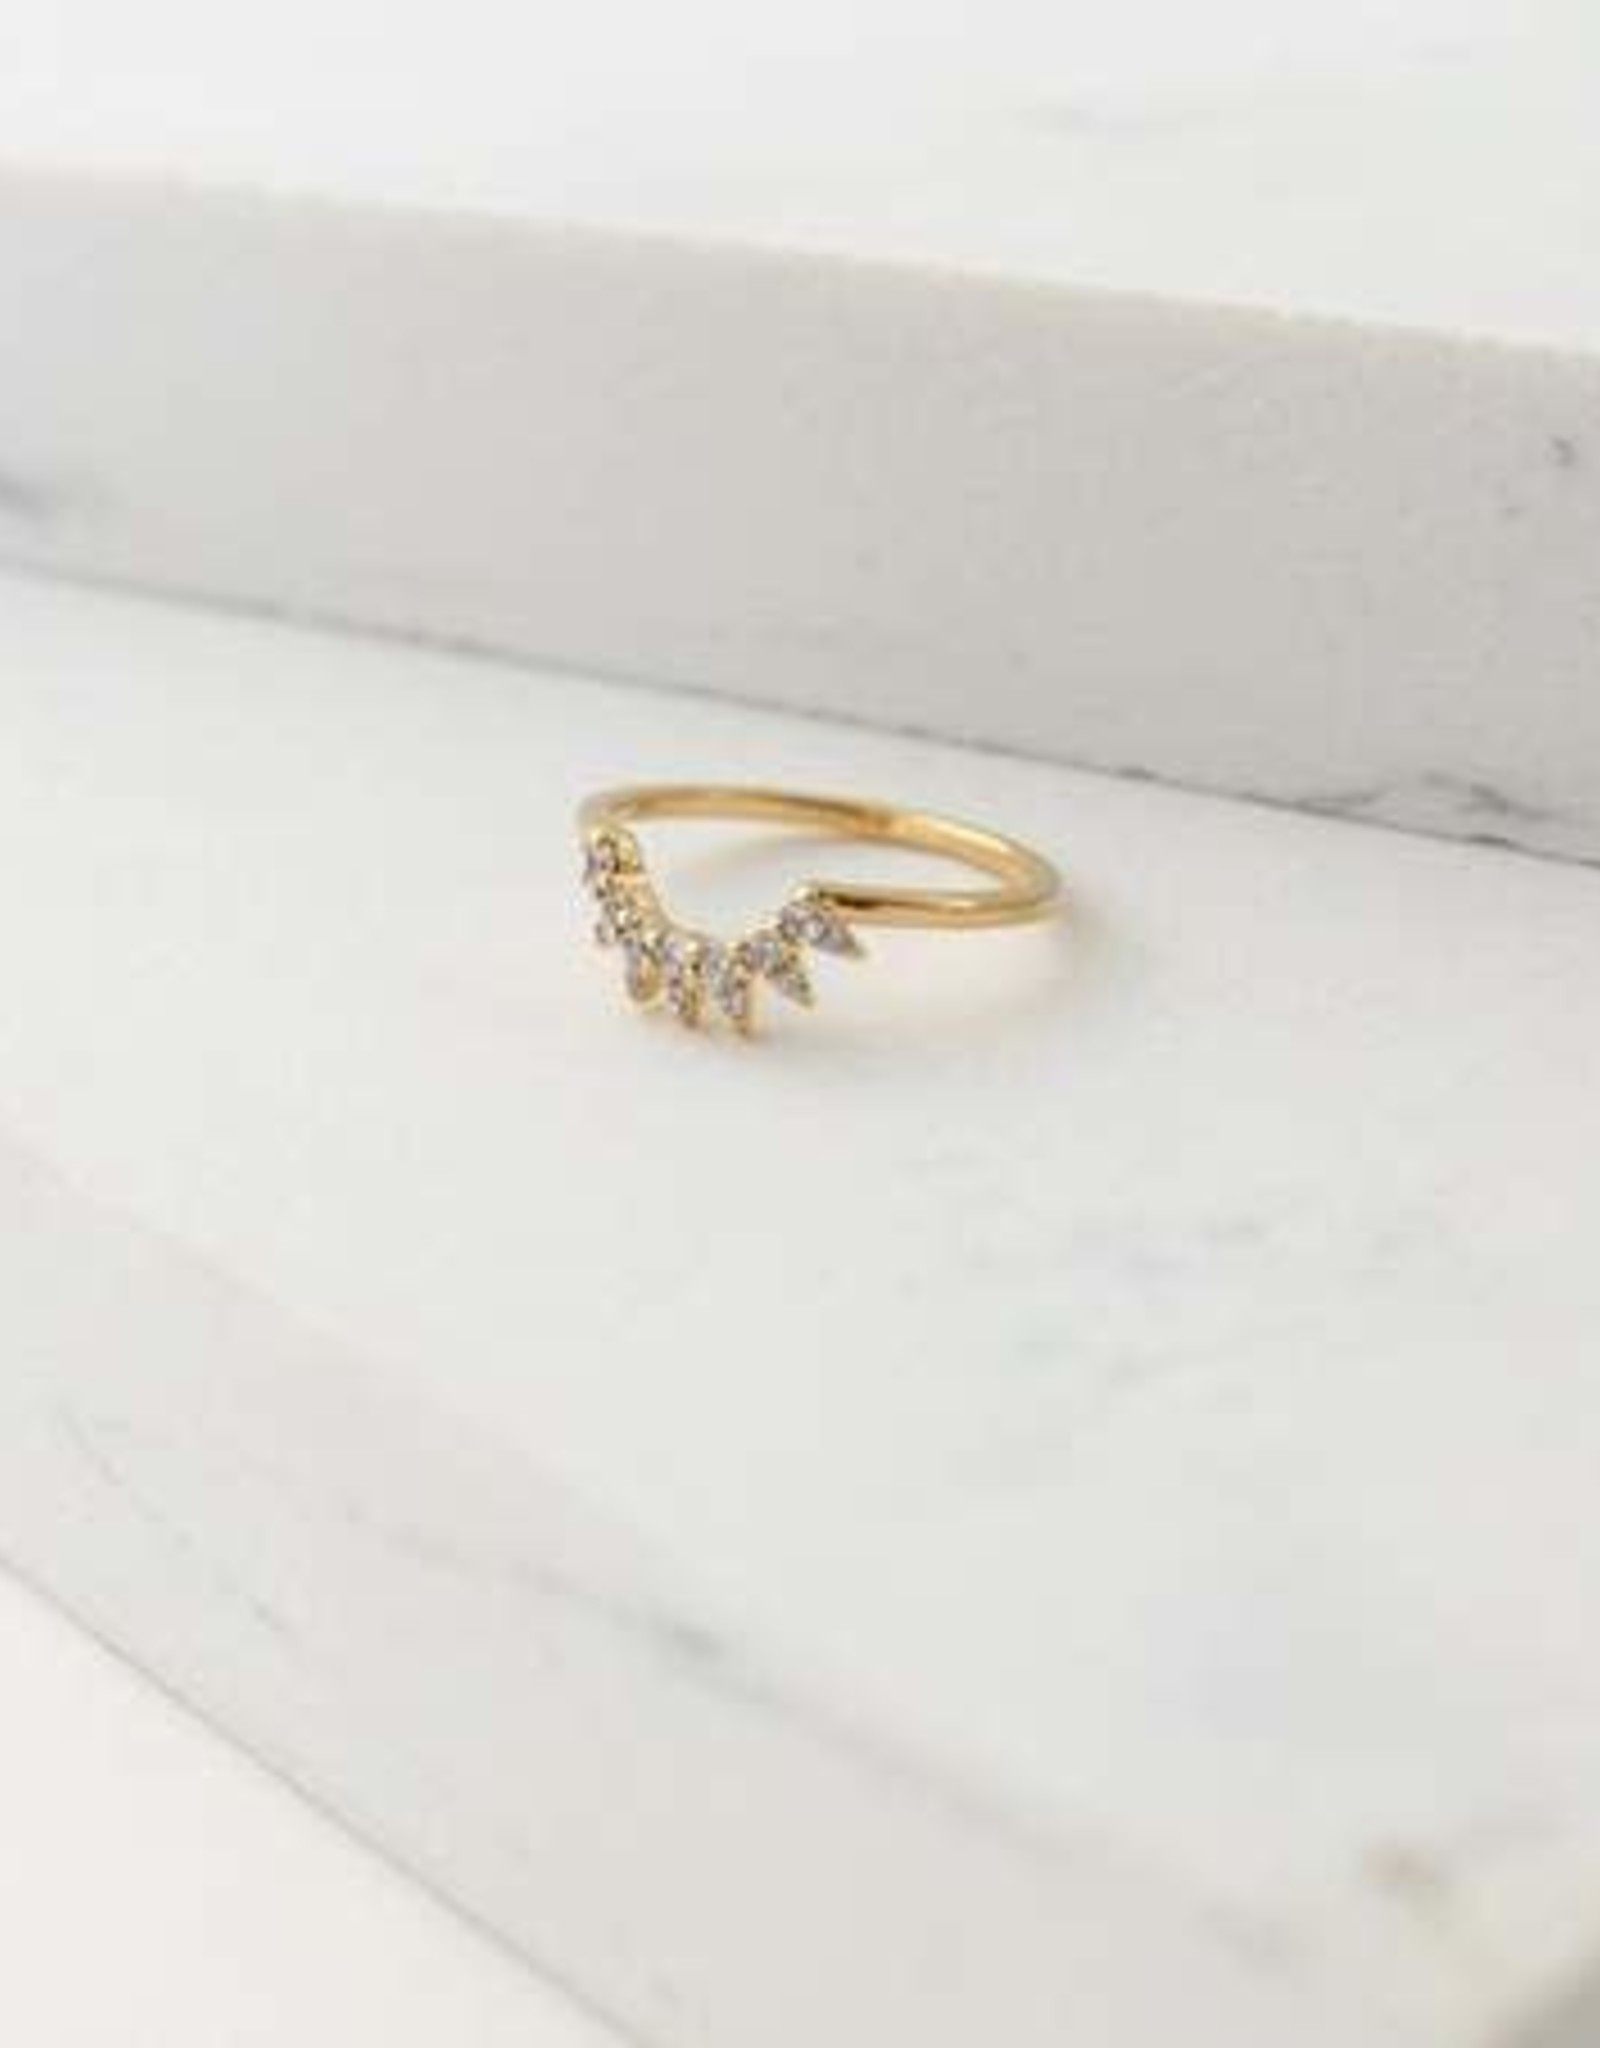 Nova Ring Size 6 - Gold